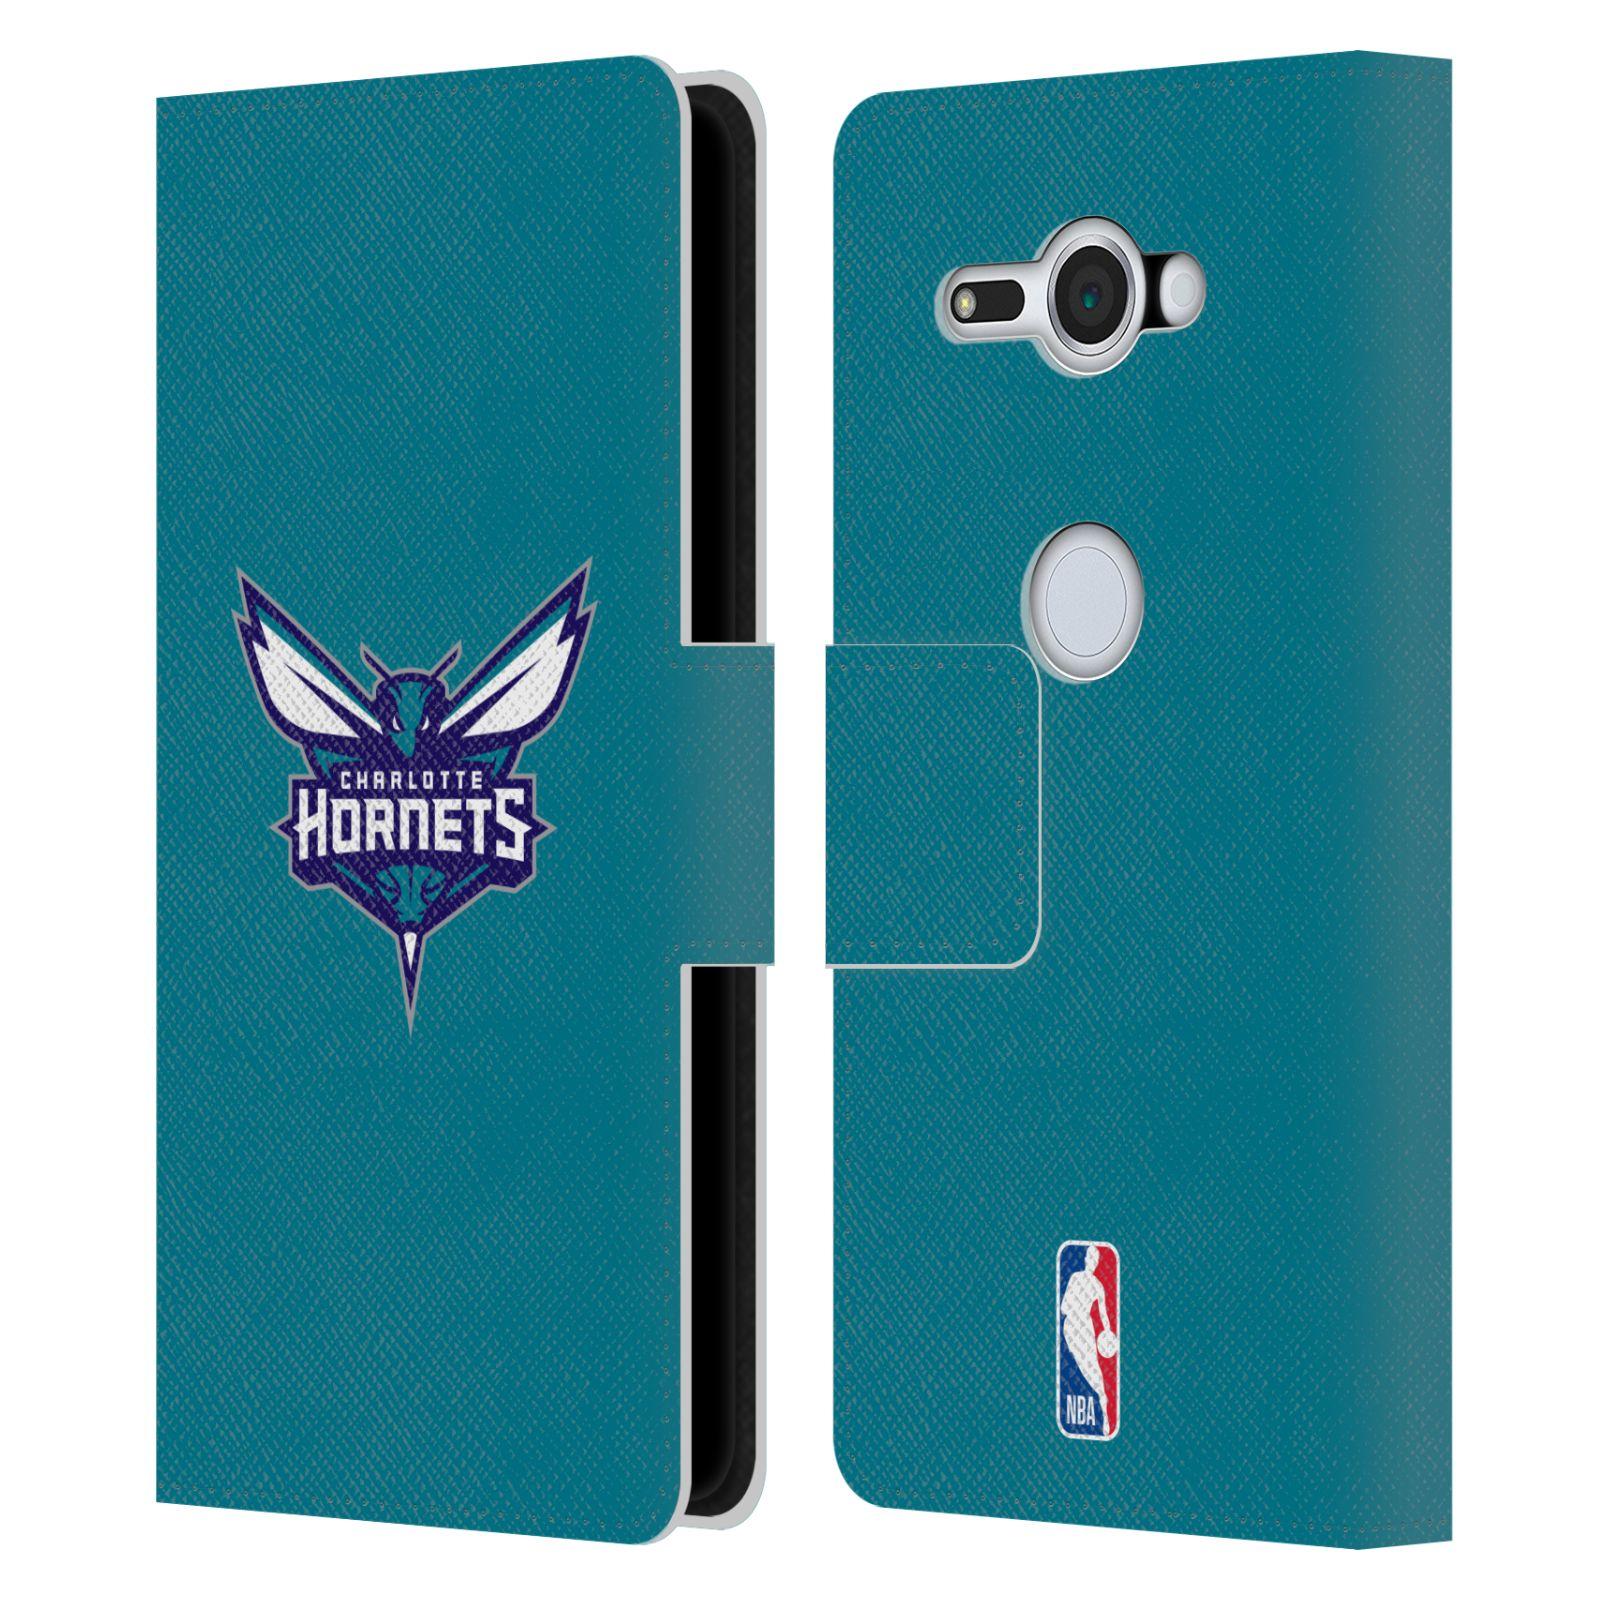 Pouzdro na mobil Sony Xperia XZ2 Compact - Head Case -NBA - Charlotte Hornets modrá barva znak